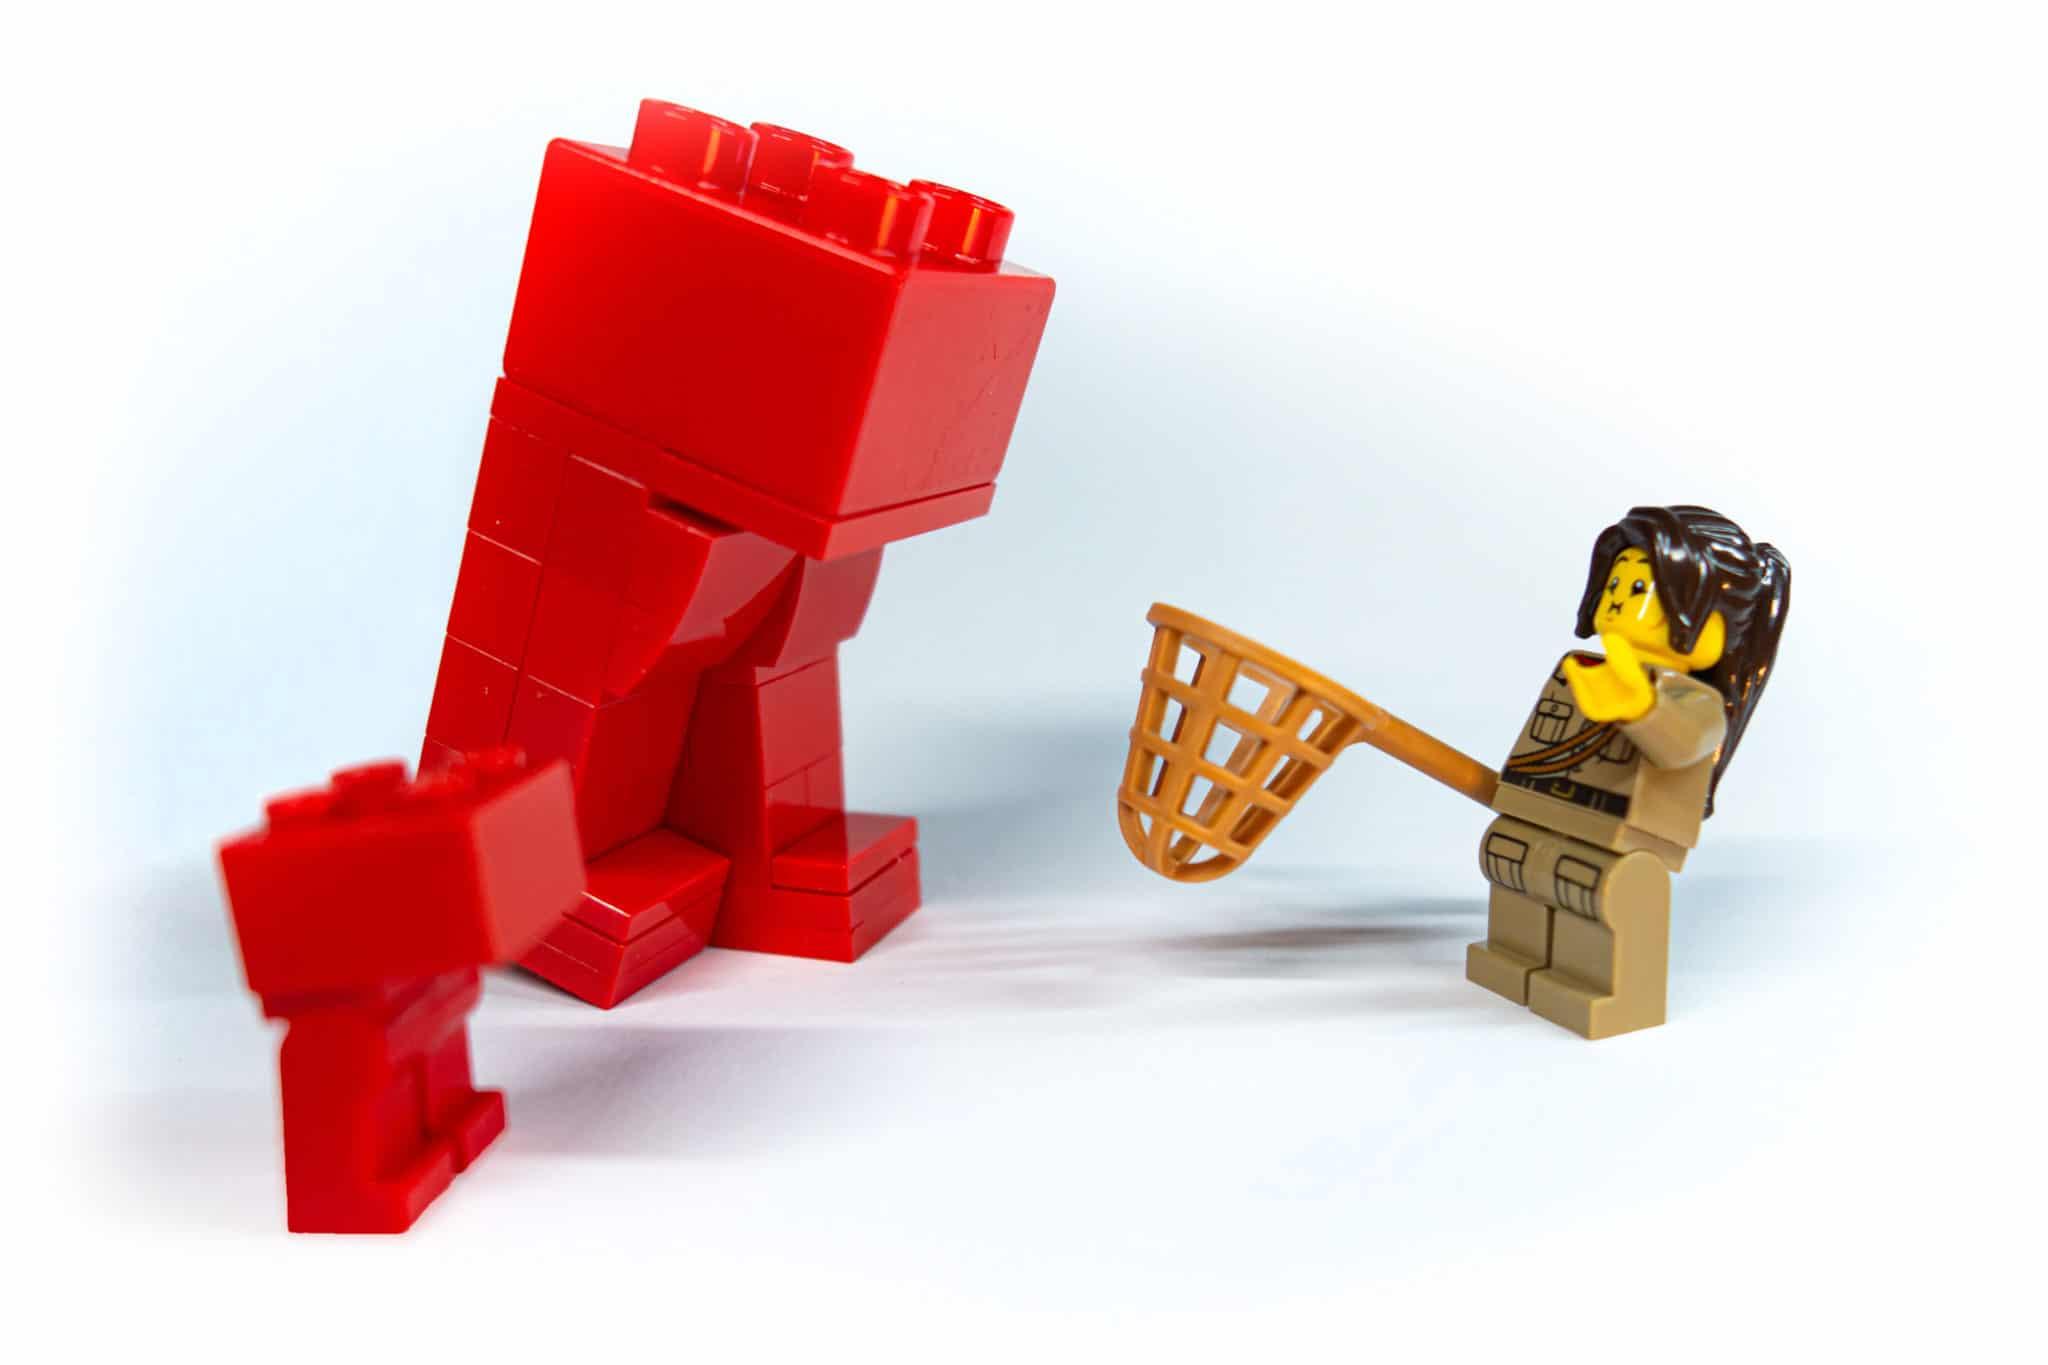 Brickhunter Aso5